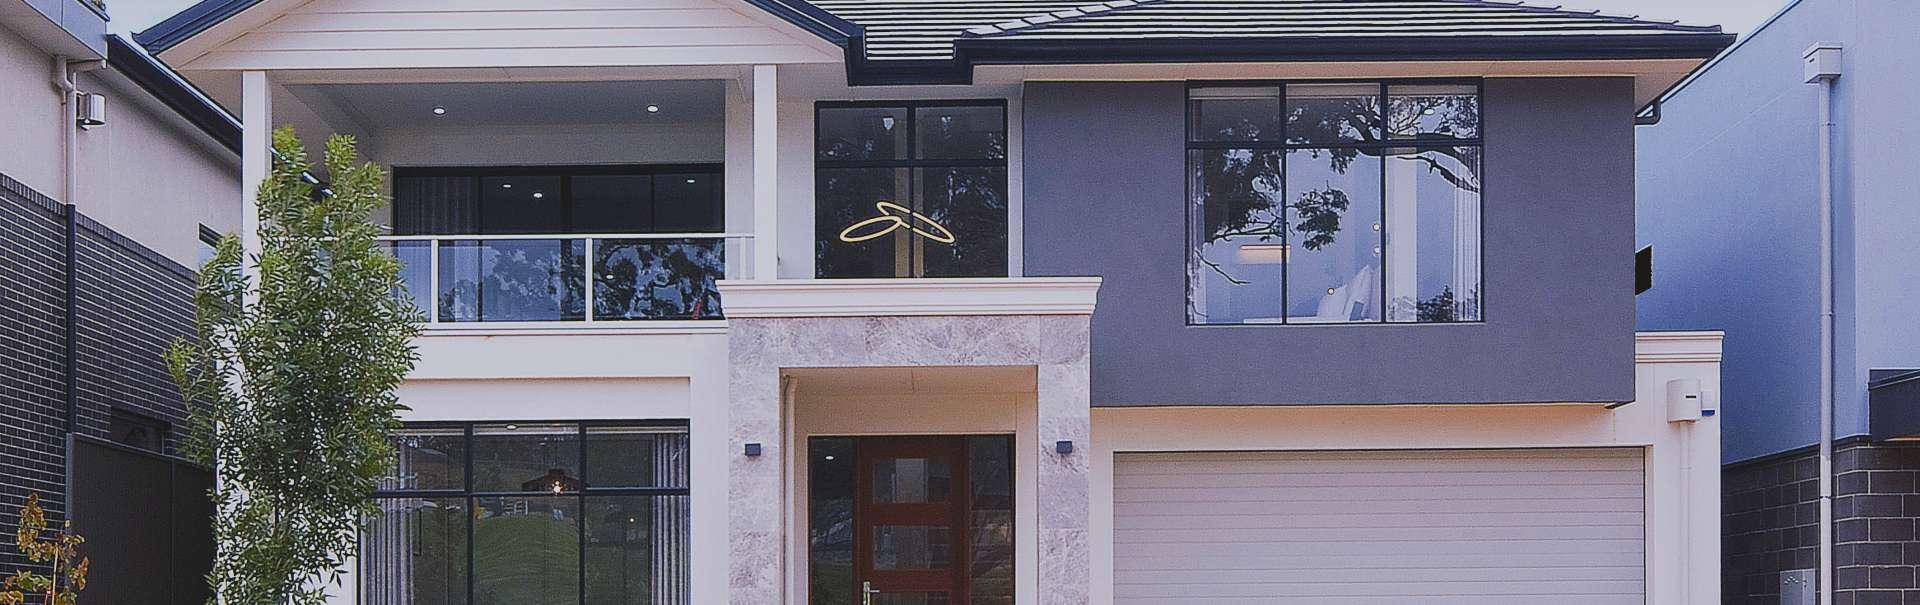 Home Rossdale Homes Rossdale Homes Adelaide South Australia Award Winning Builder Custom Design Houses Investment Property House Land